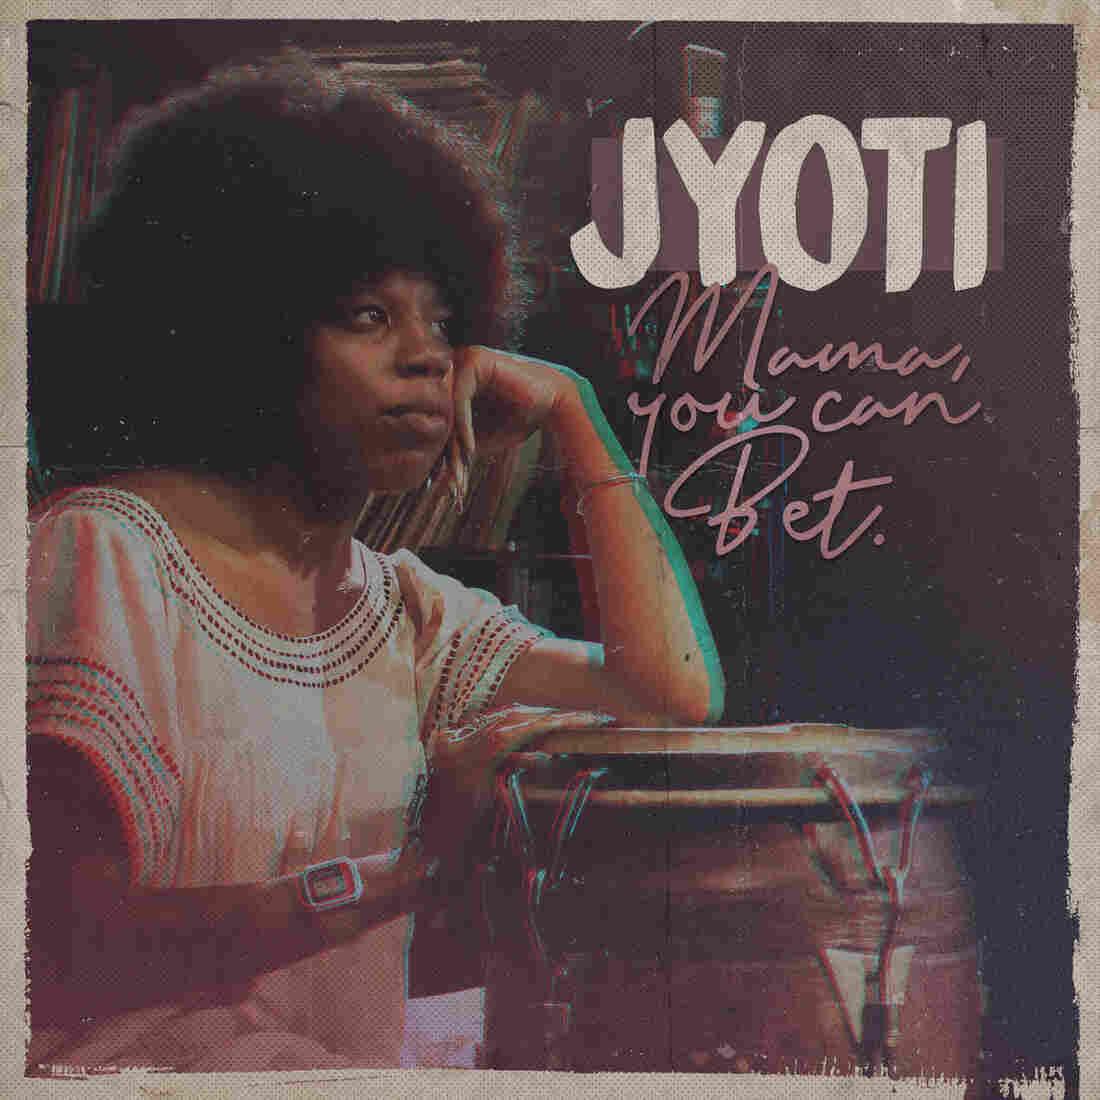 Jyoti (Georgia Anne Muldrow), Mama, You Can Bet!